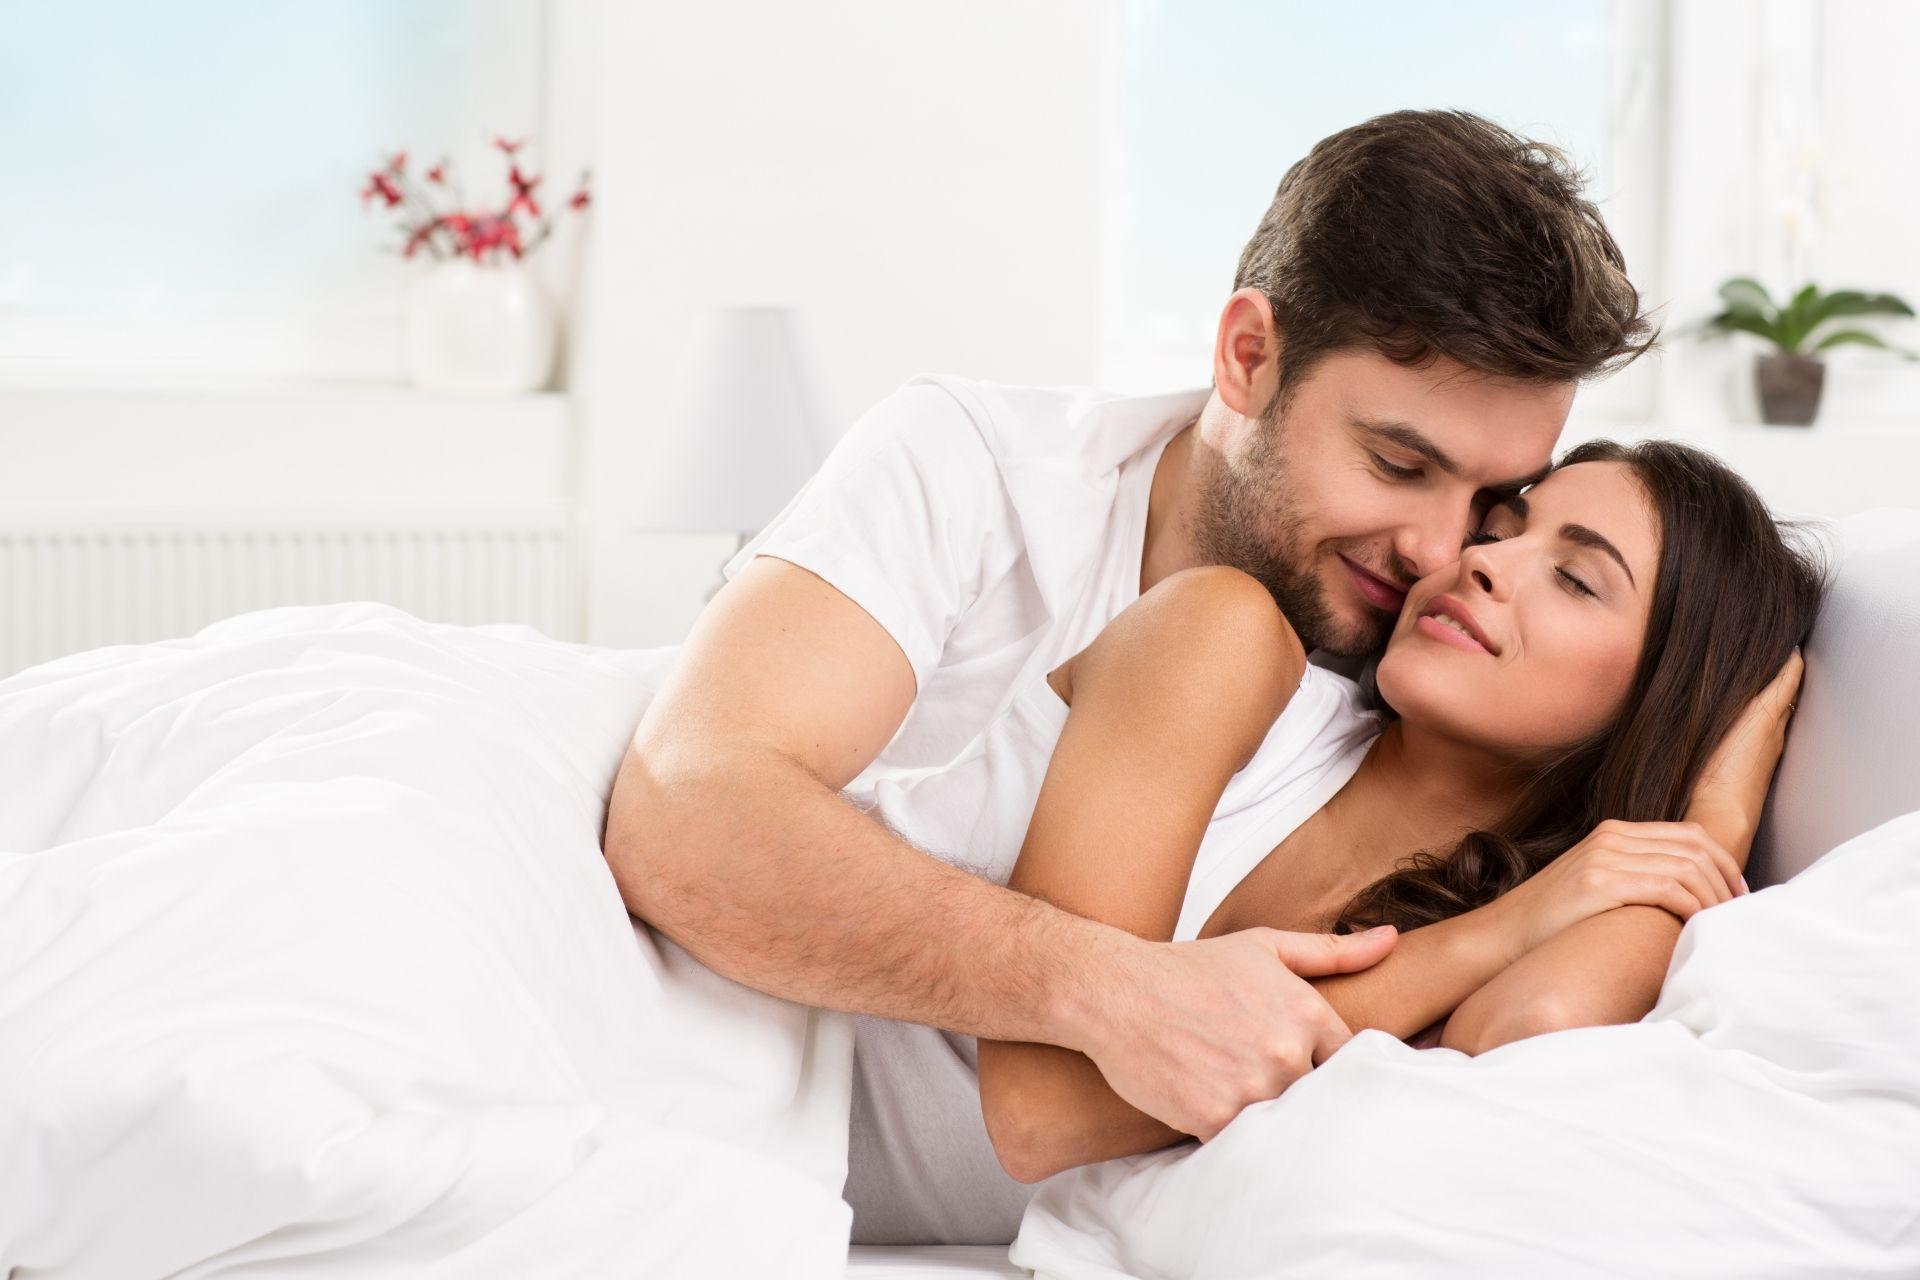 intimacy rituals